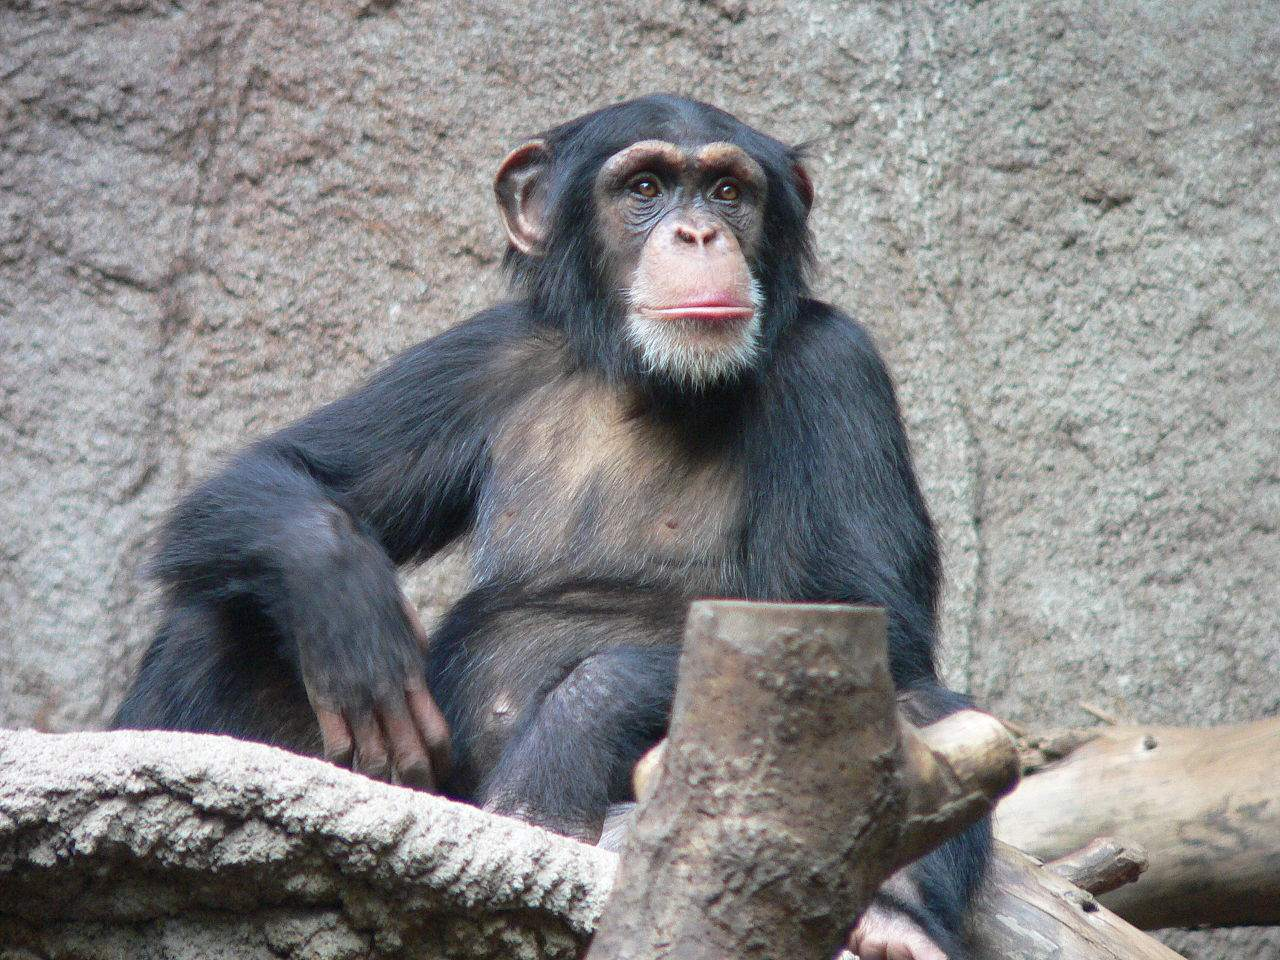 Affe besser als Fondsmanager